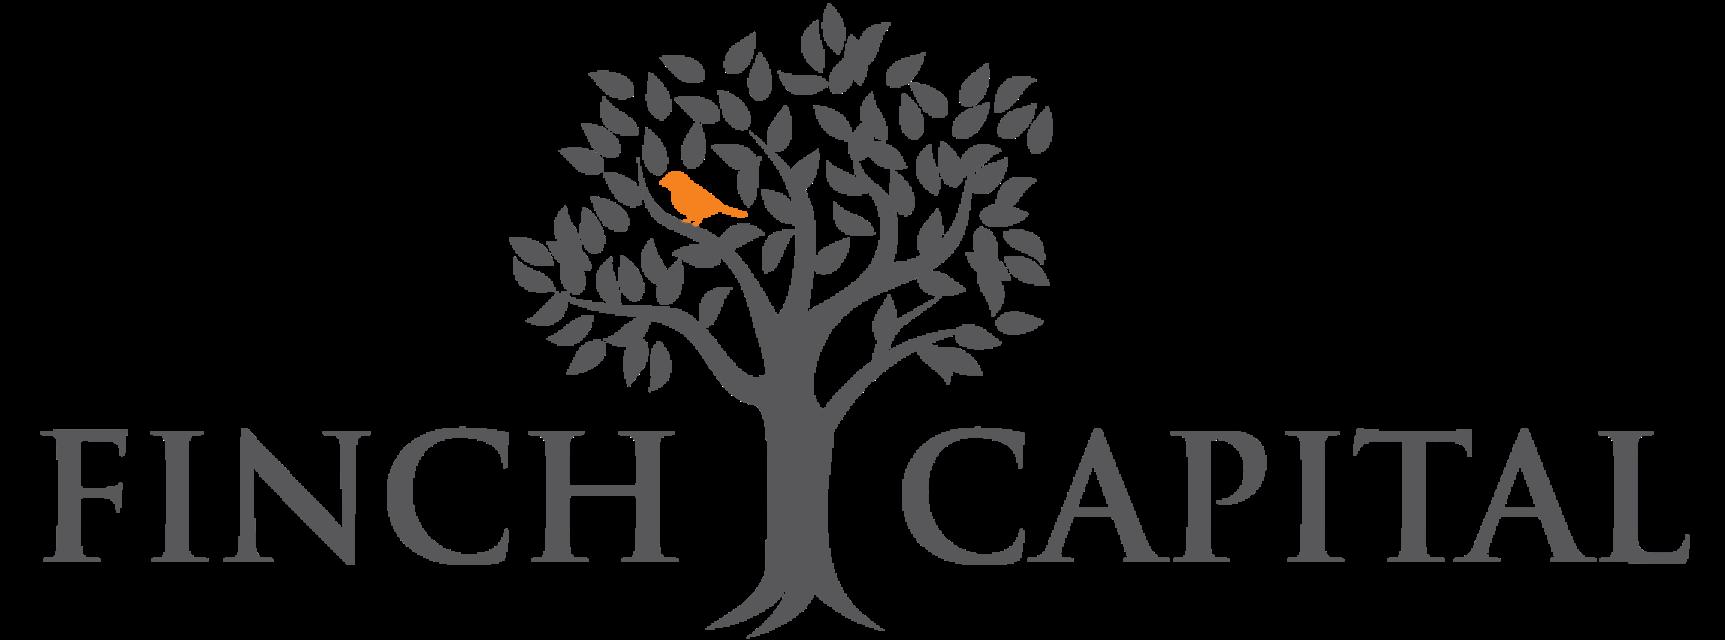 Finch Capital logo